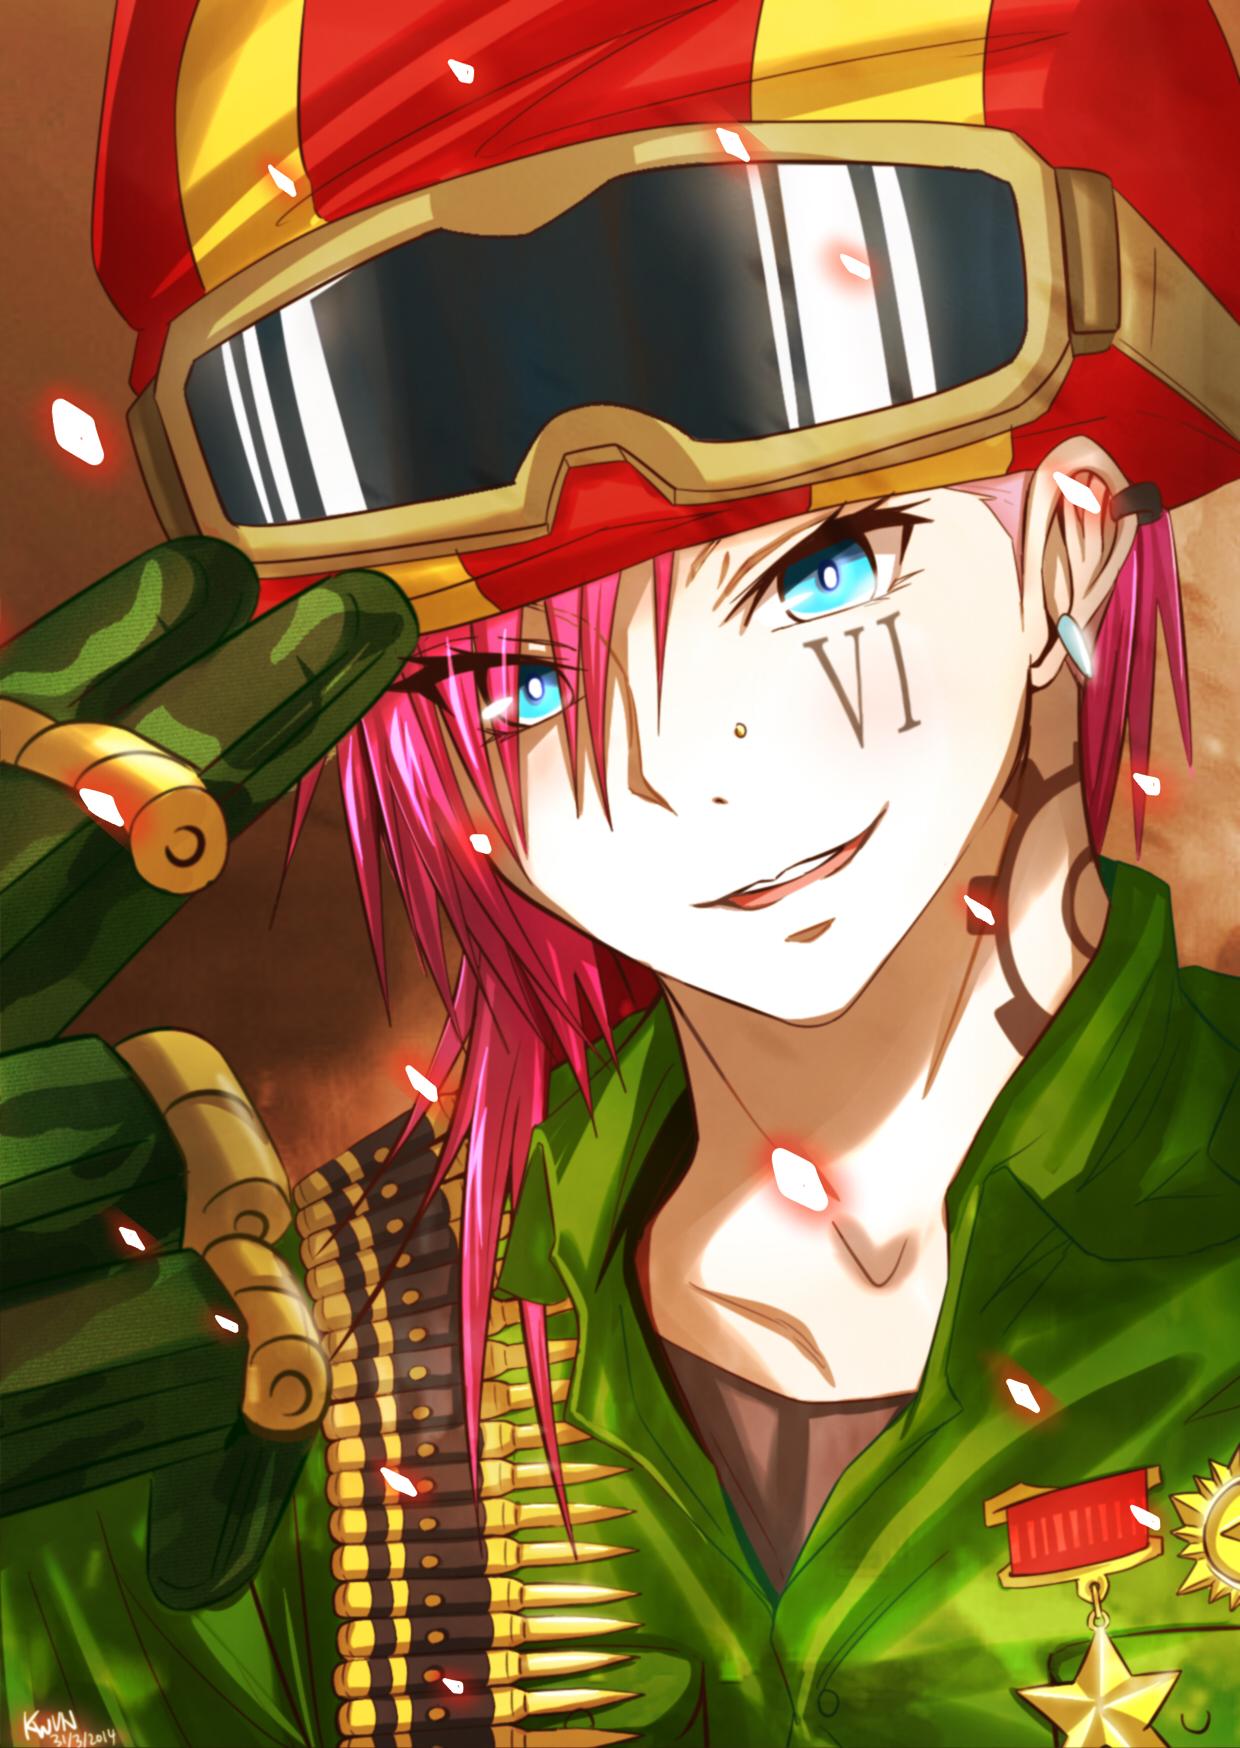 Vi League Of Legends Mobile Wallpaper 1709607 Zerochan Anime